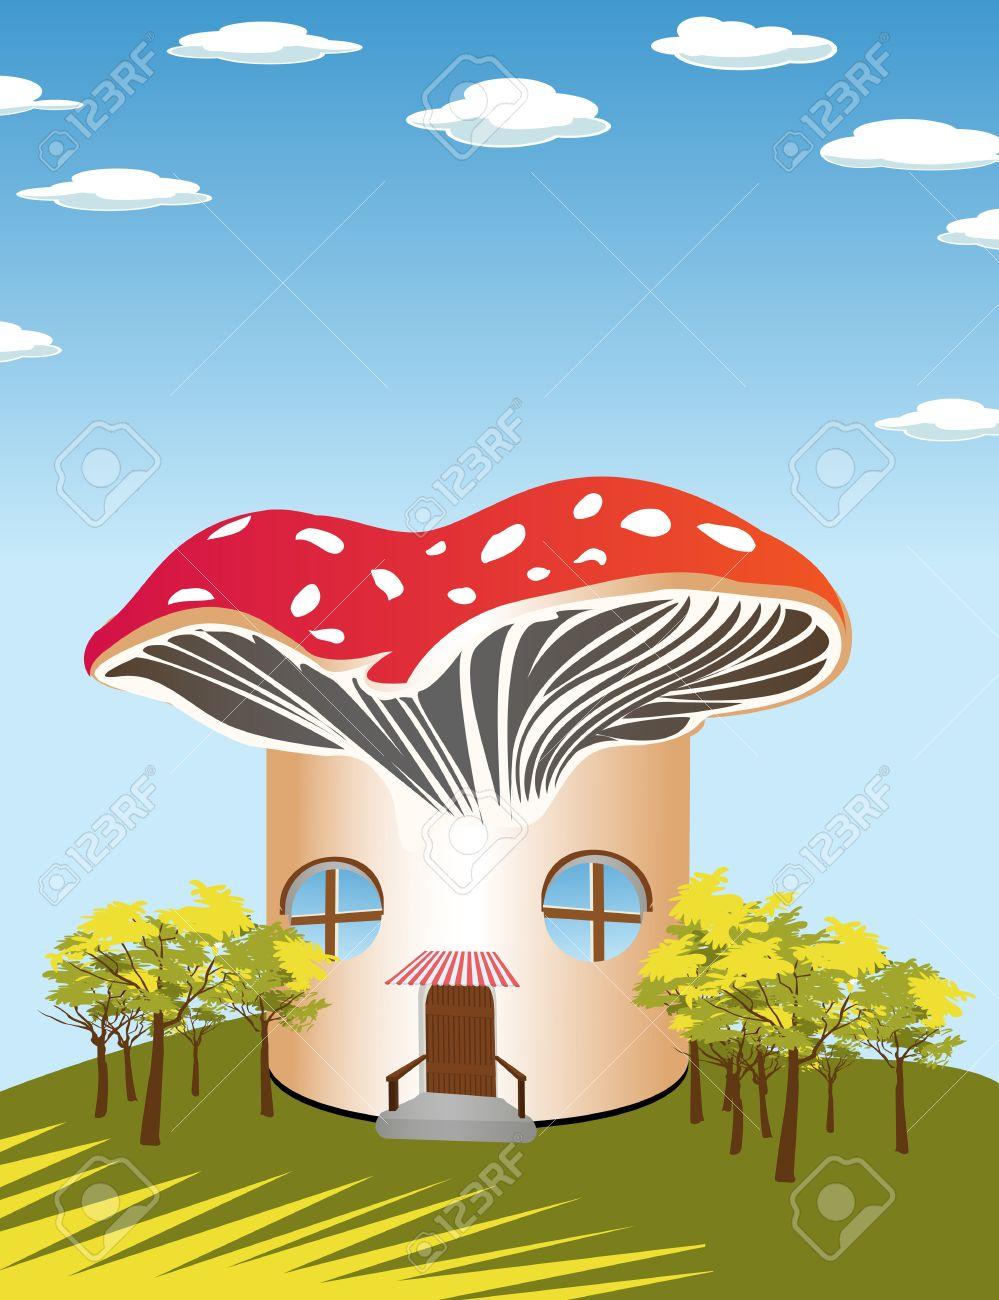 Fantasy Cartoon Background With A Mushroom Shape House Royalty.